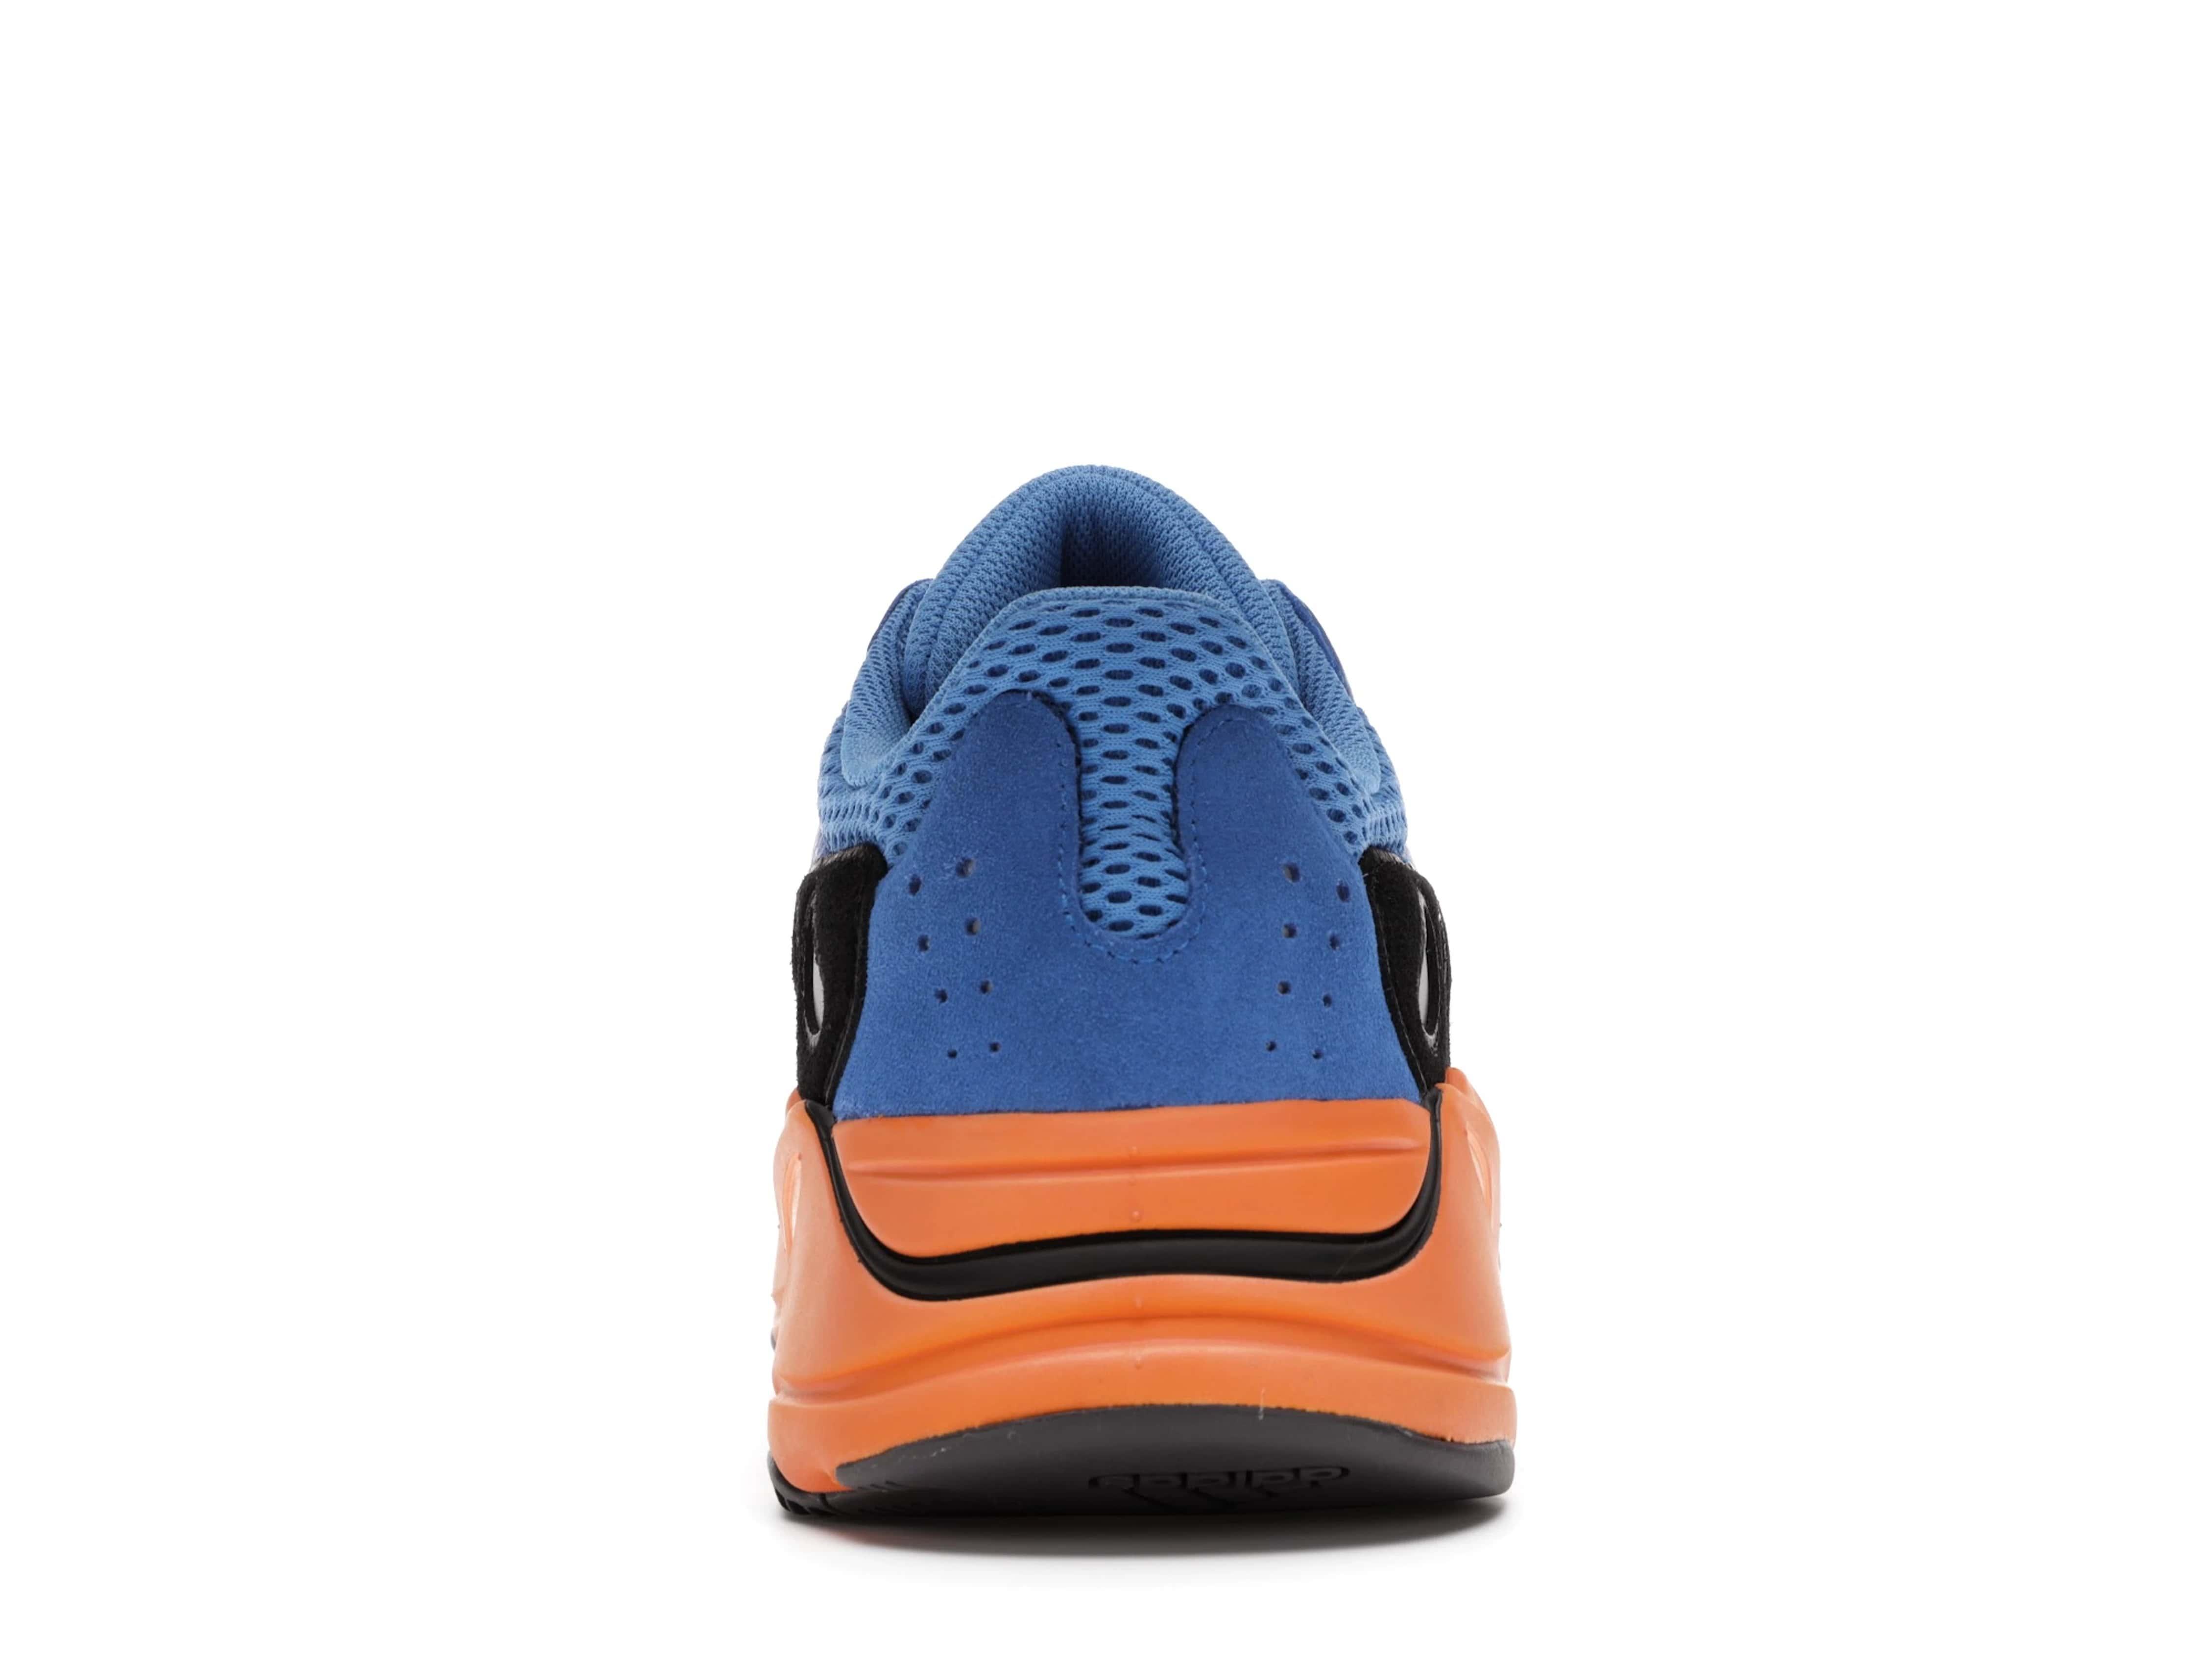 slide 4 - Yeezy 700 Bright Blue